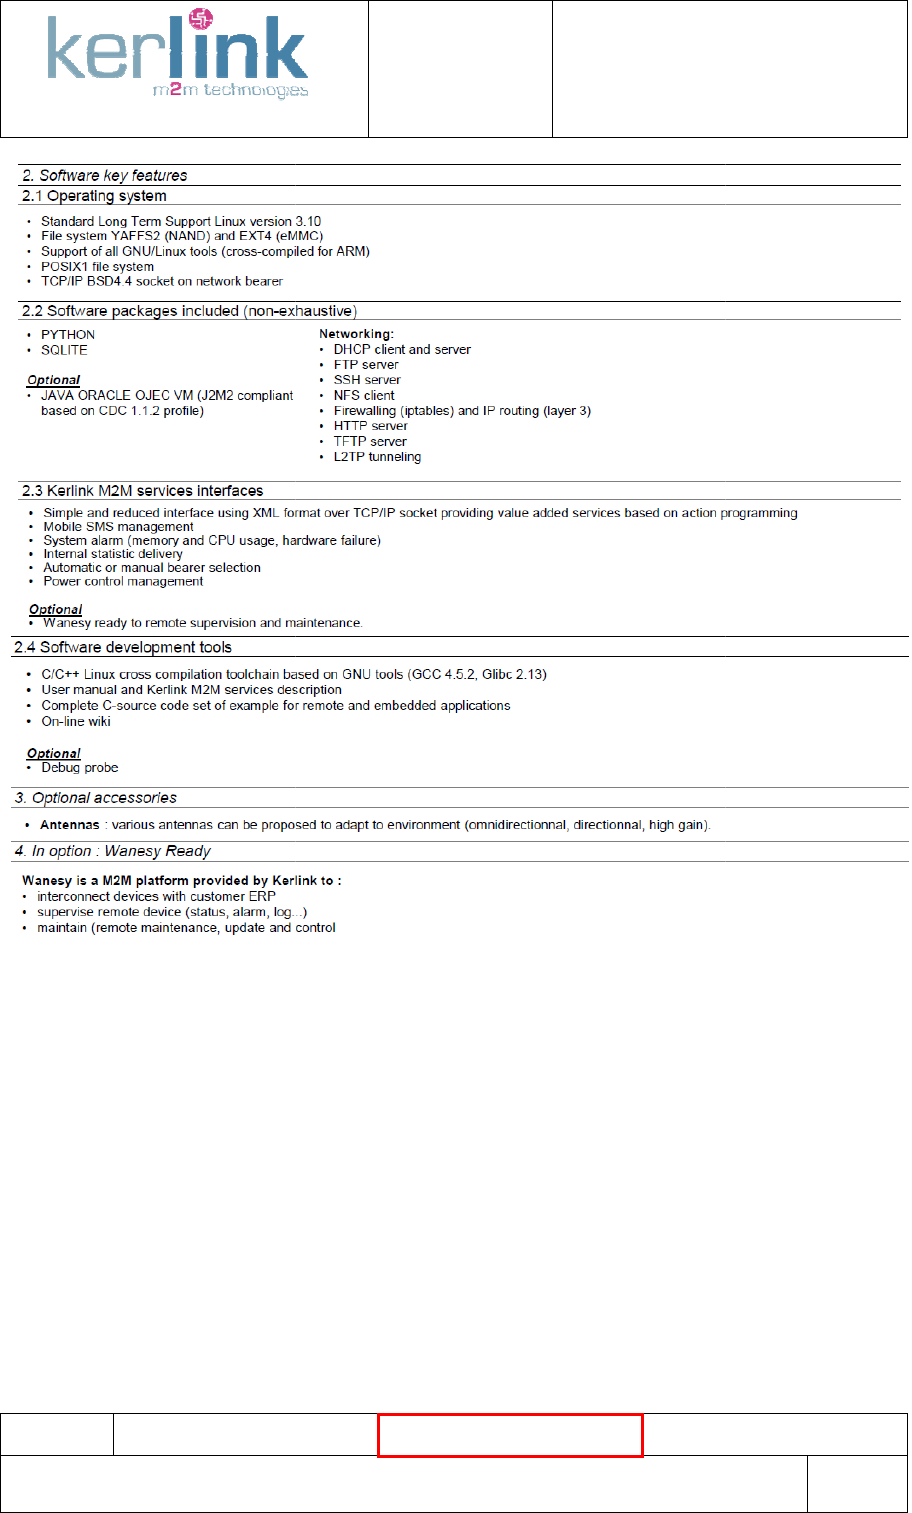 KERLINK KLK915LOI Tele transmission User Manual